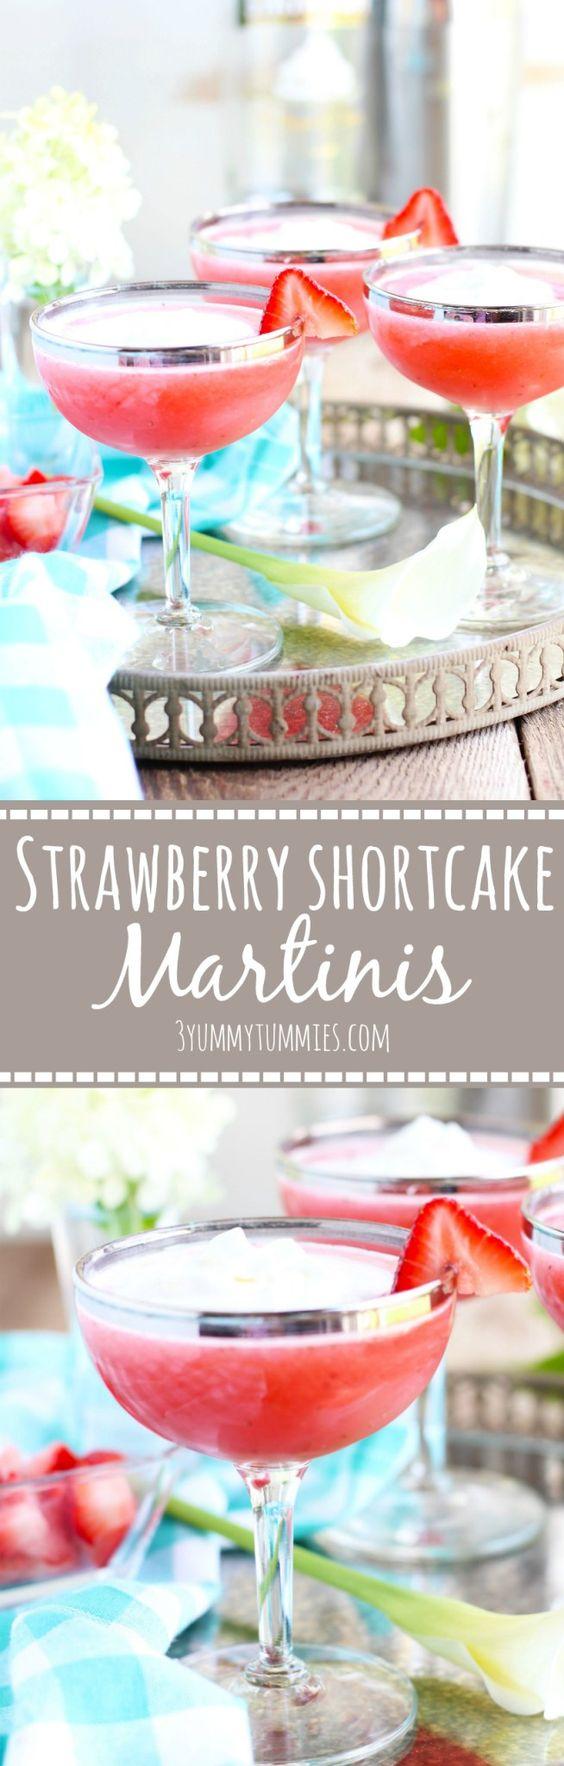 Strawberry Shortcake Martinis